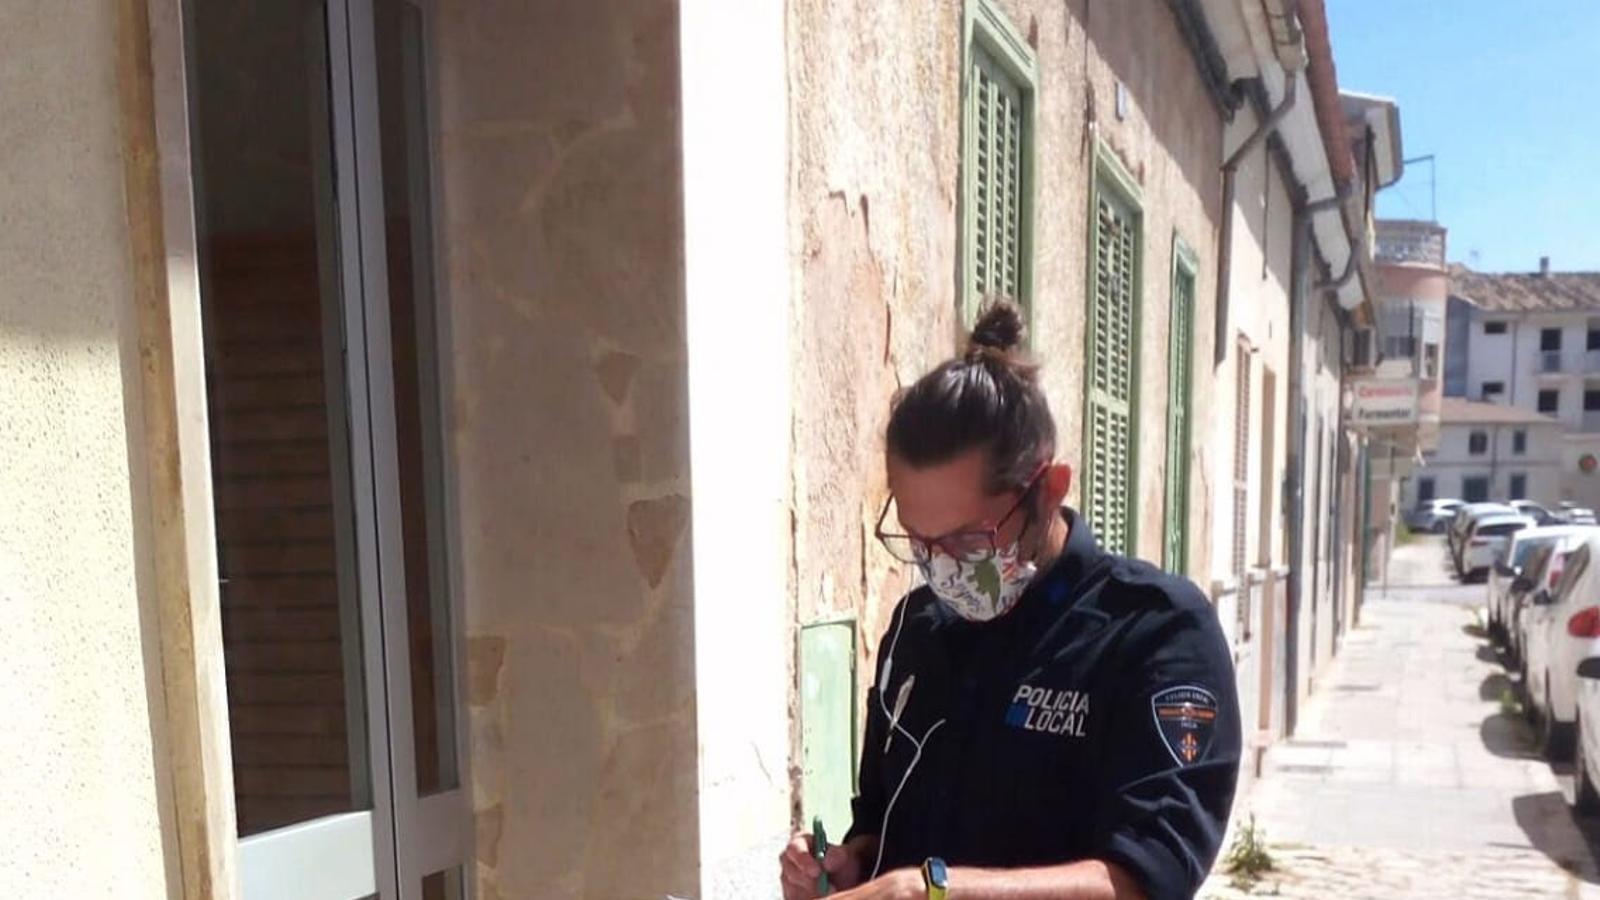 El policia tutor repartint material escolar.